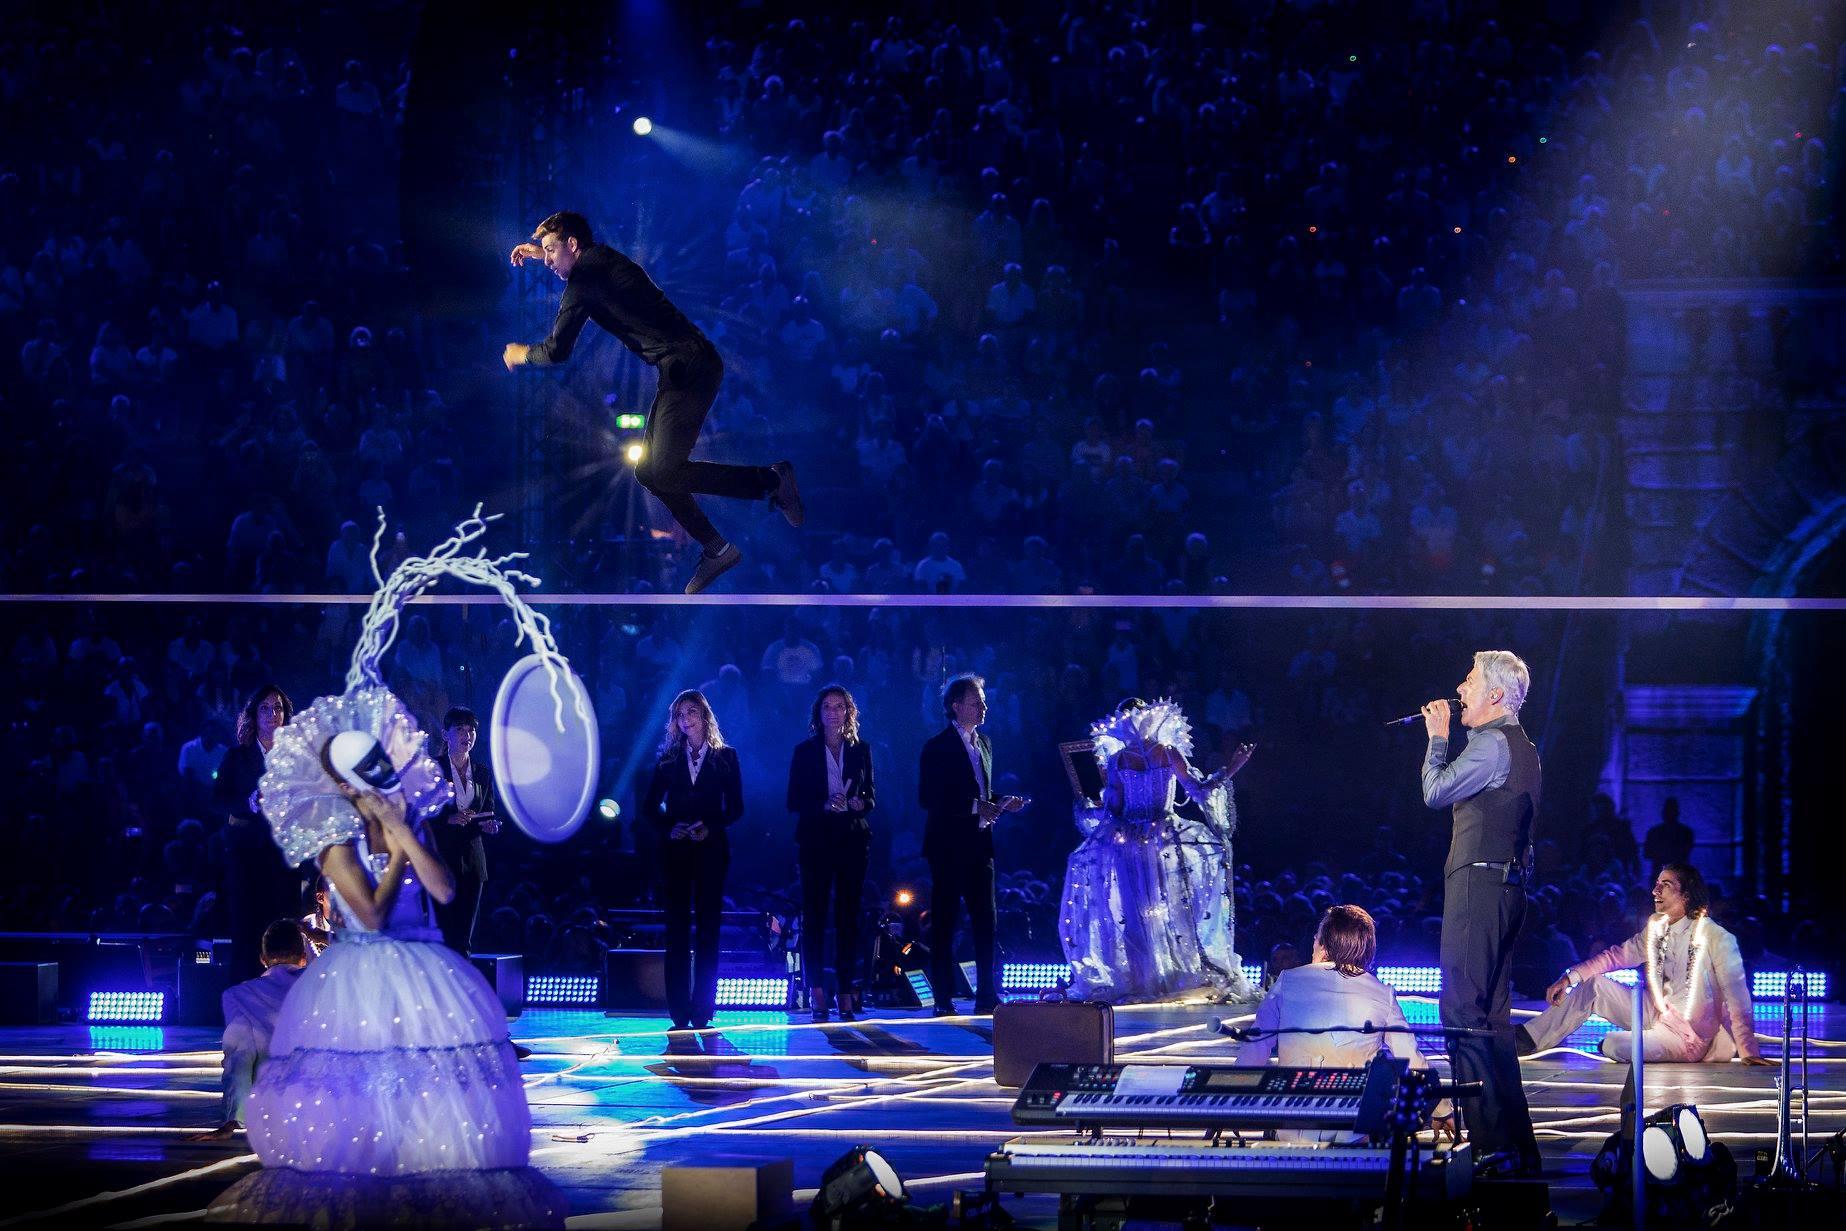 claudio baglioni arena di verona italia italy 50 al centro highline trickline show funambule circus performance spectacle suisse Slackline Lyell Grunberg  (5).jpg